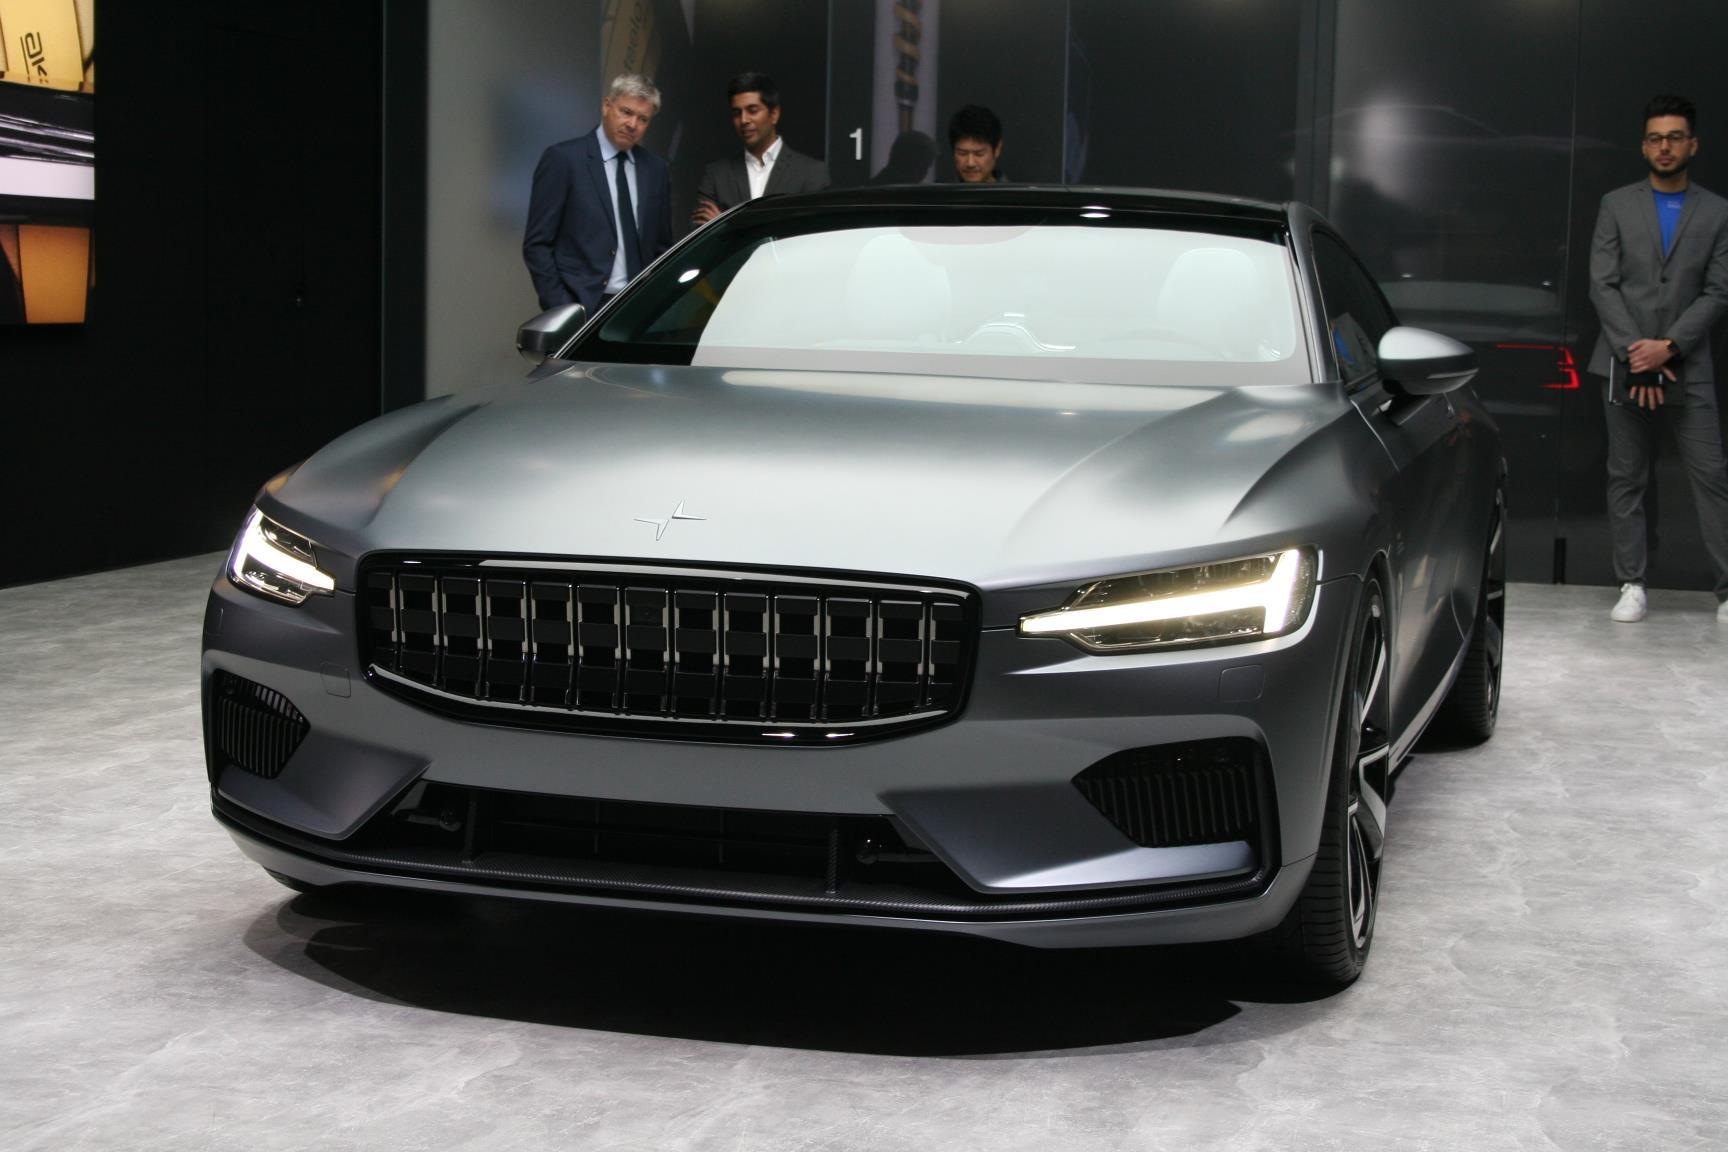 Geneva Motor Show 2018 Mega Gallery Part 1 (145)